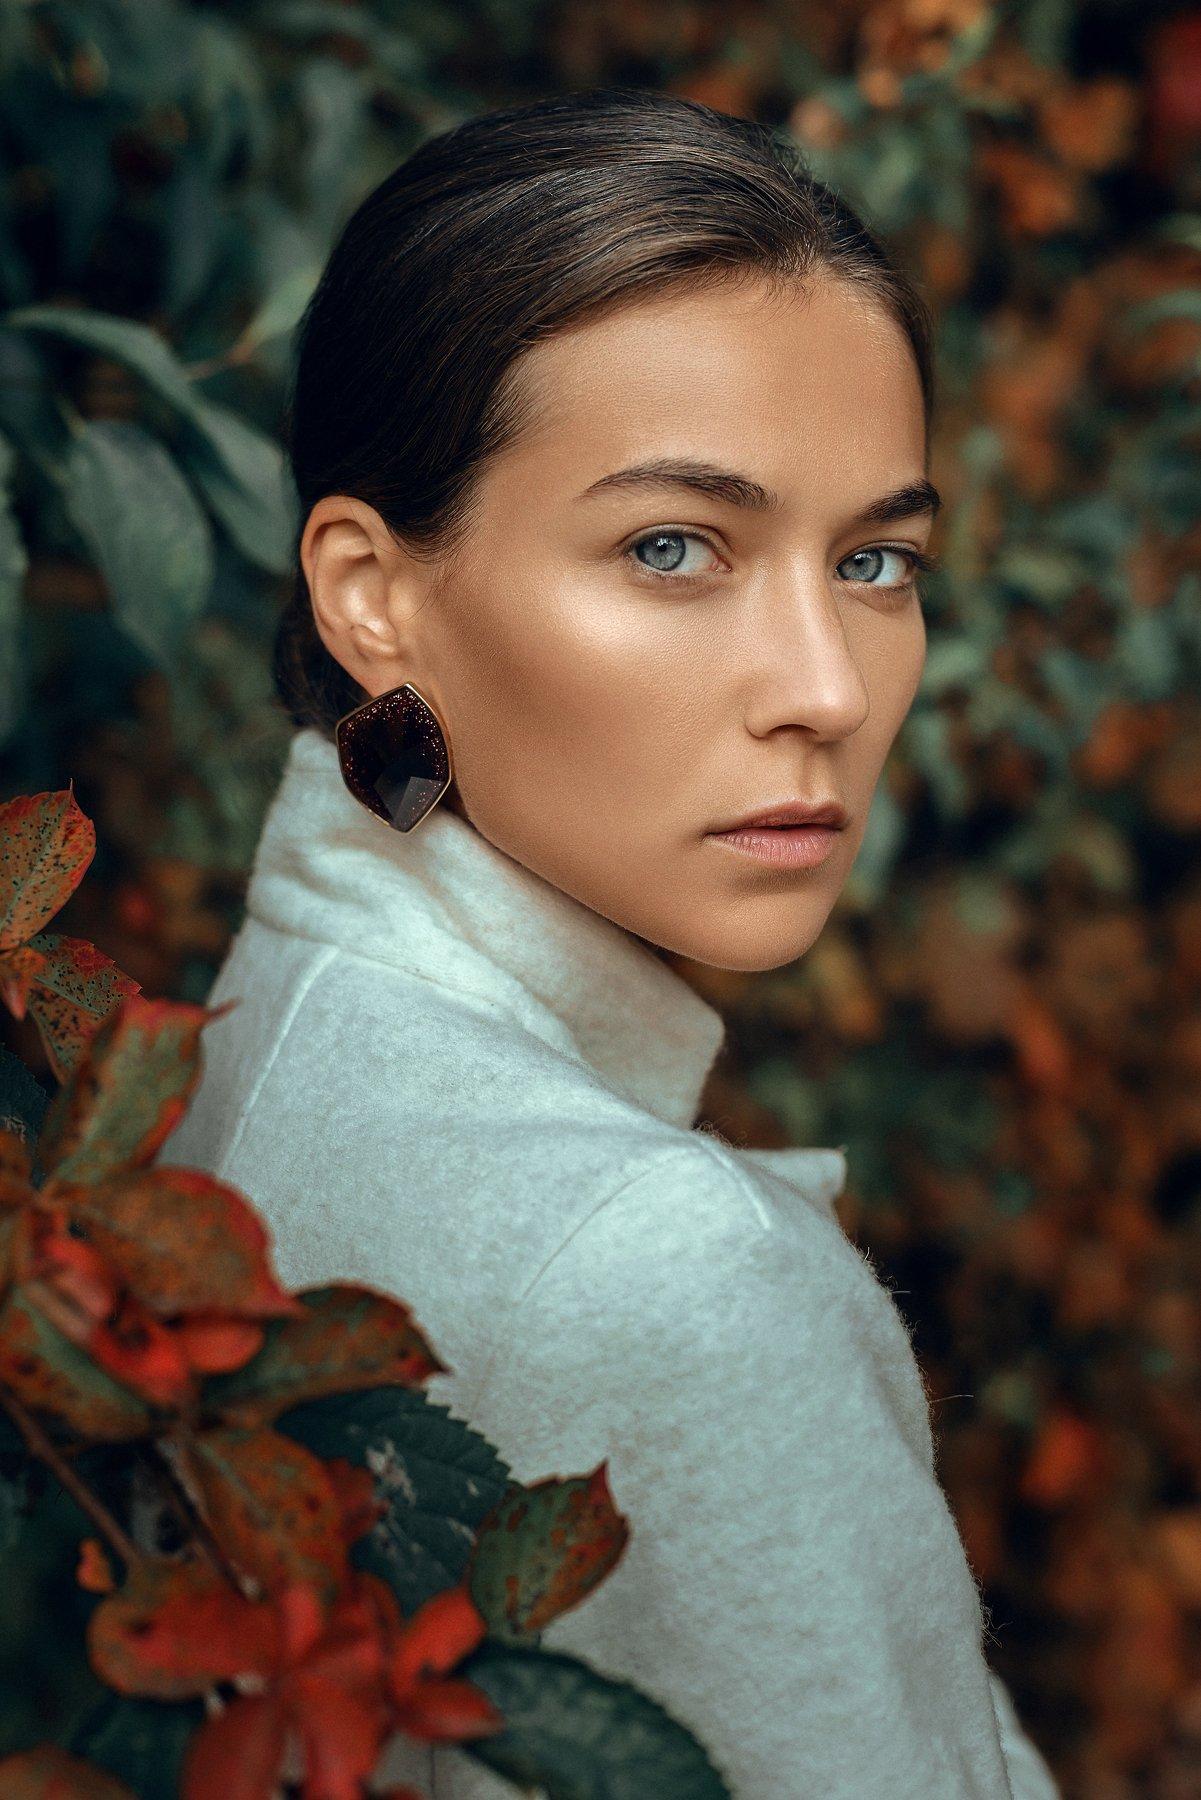 фото, портрет, цвет, colour, portrait, eyes, woman, girl, art, Павел Соколов